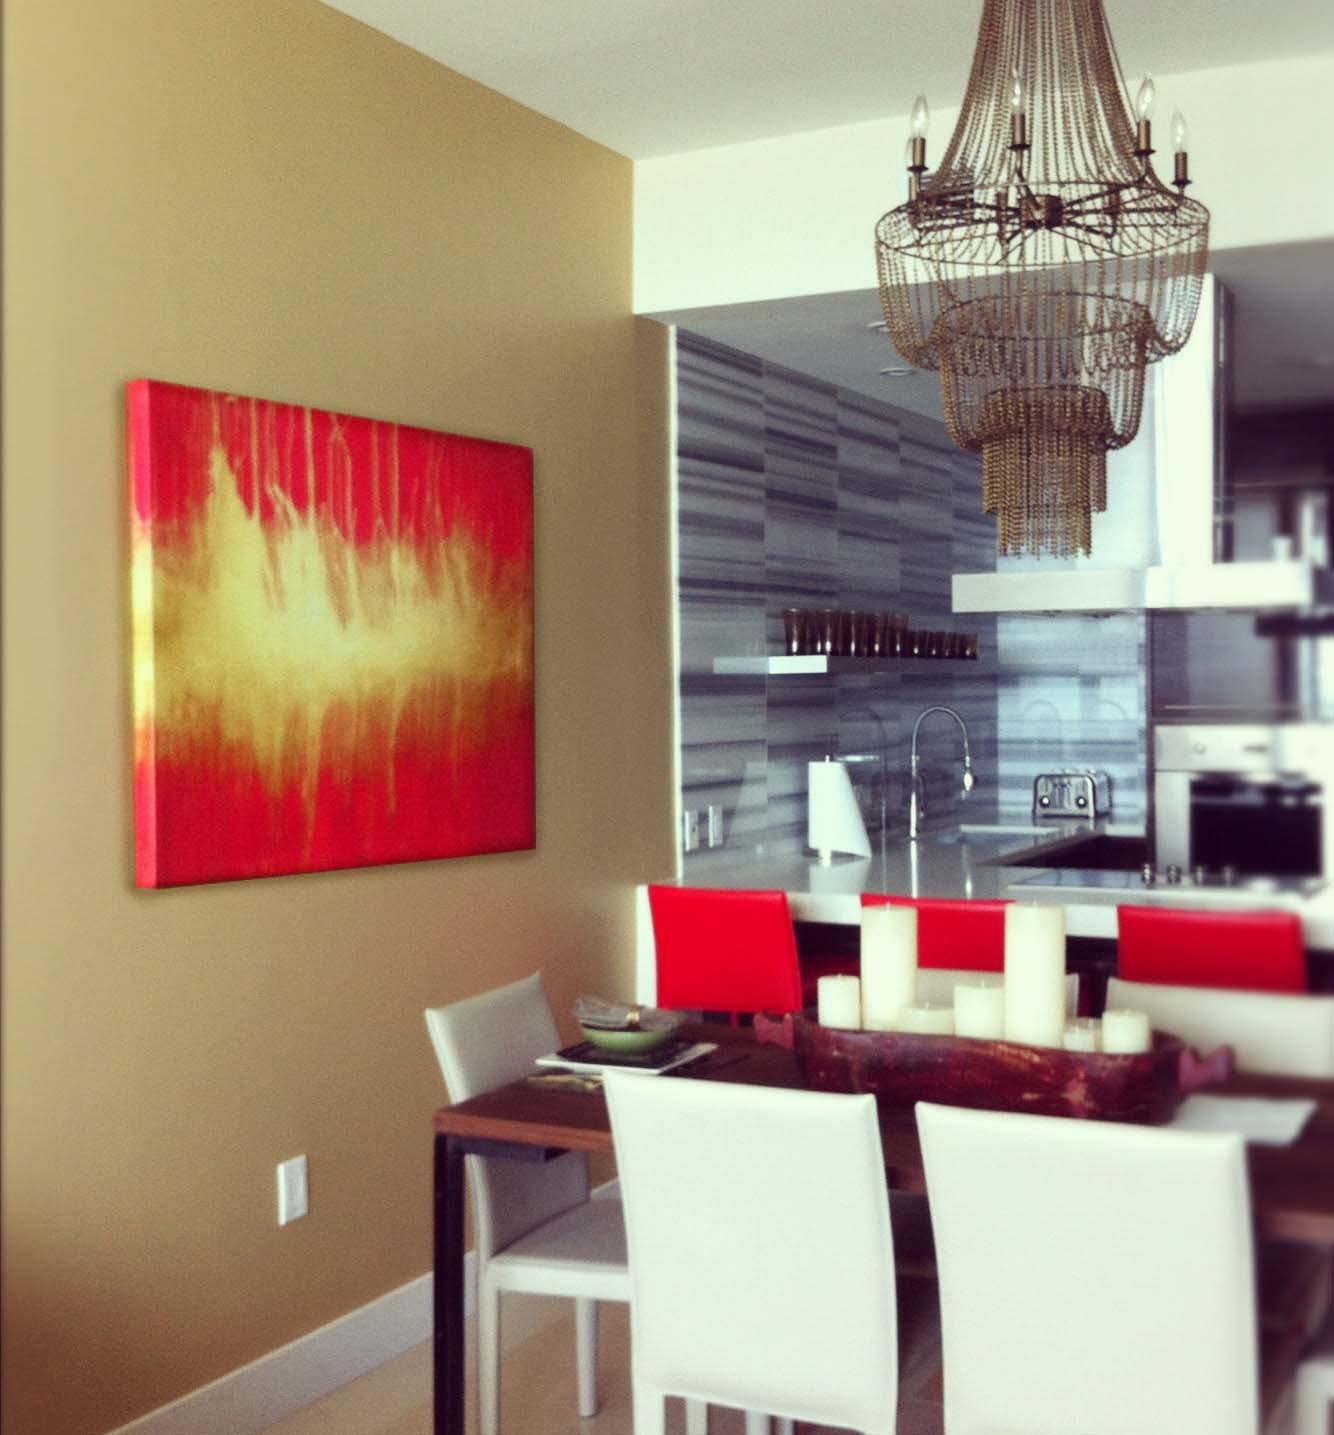 miami spice penthouse design dimare interior agenda